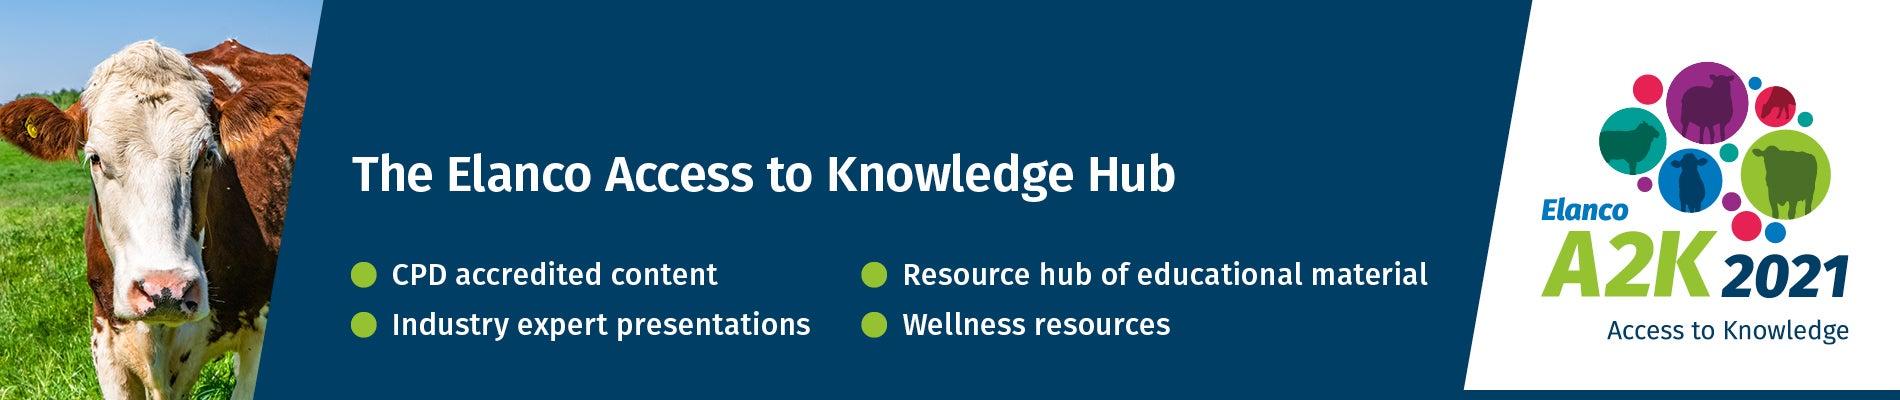 Elanco Access to Knowledge